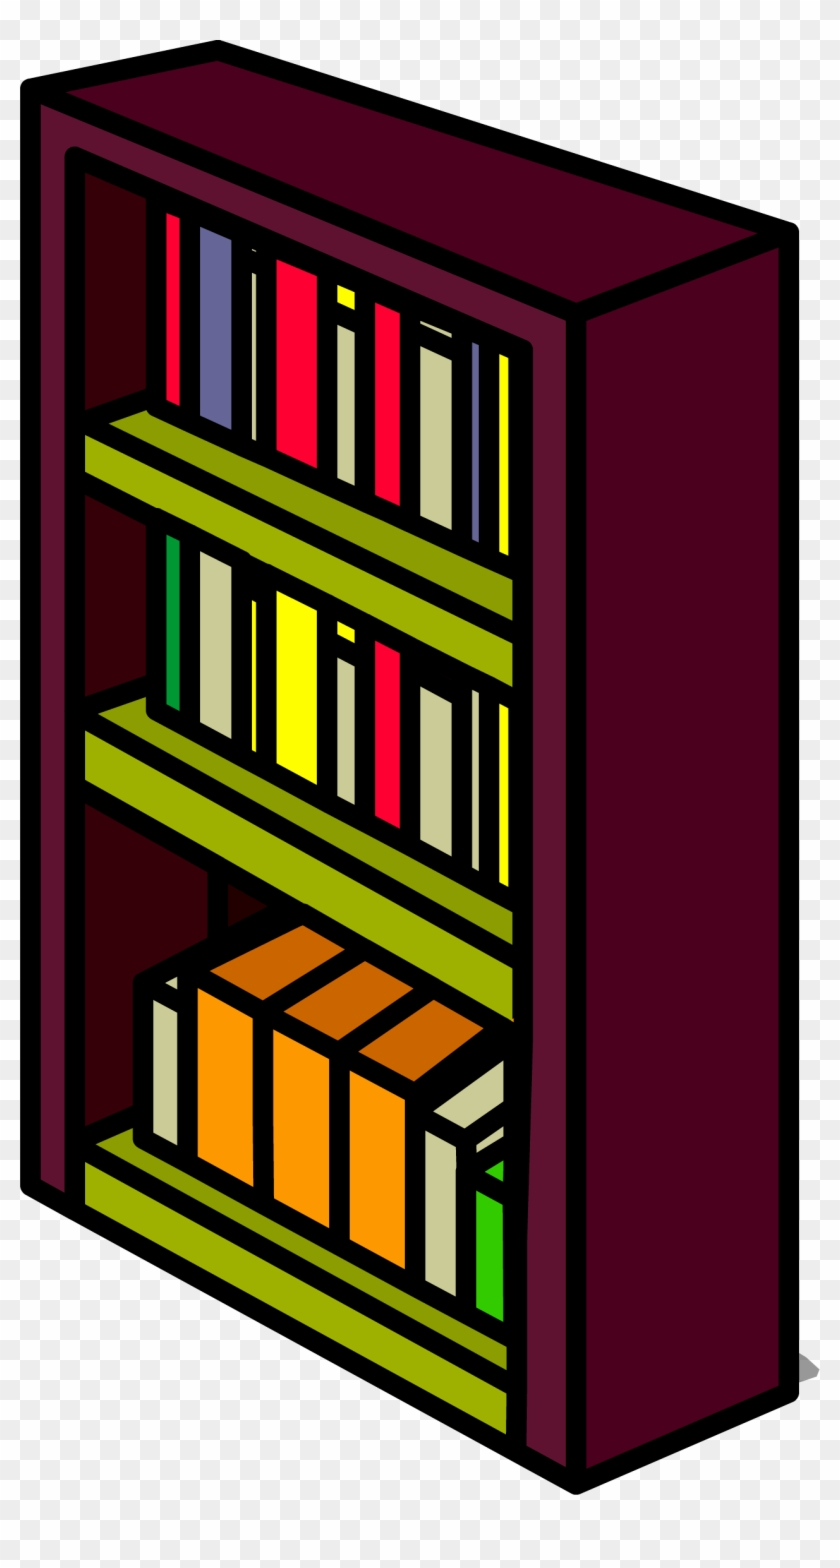 Burgundy Bookshelf Sprite 006 - Bookcase #776347